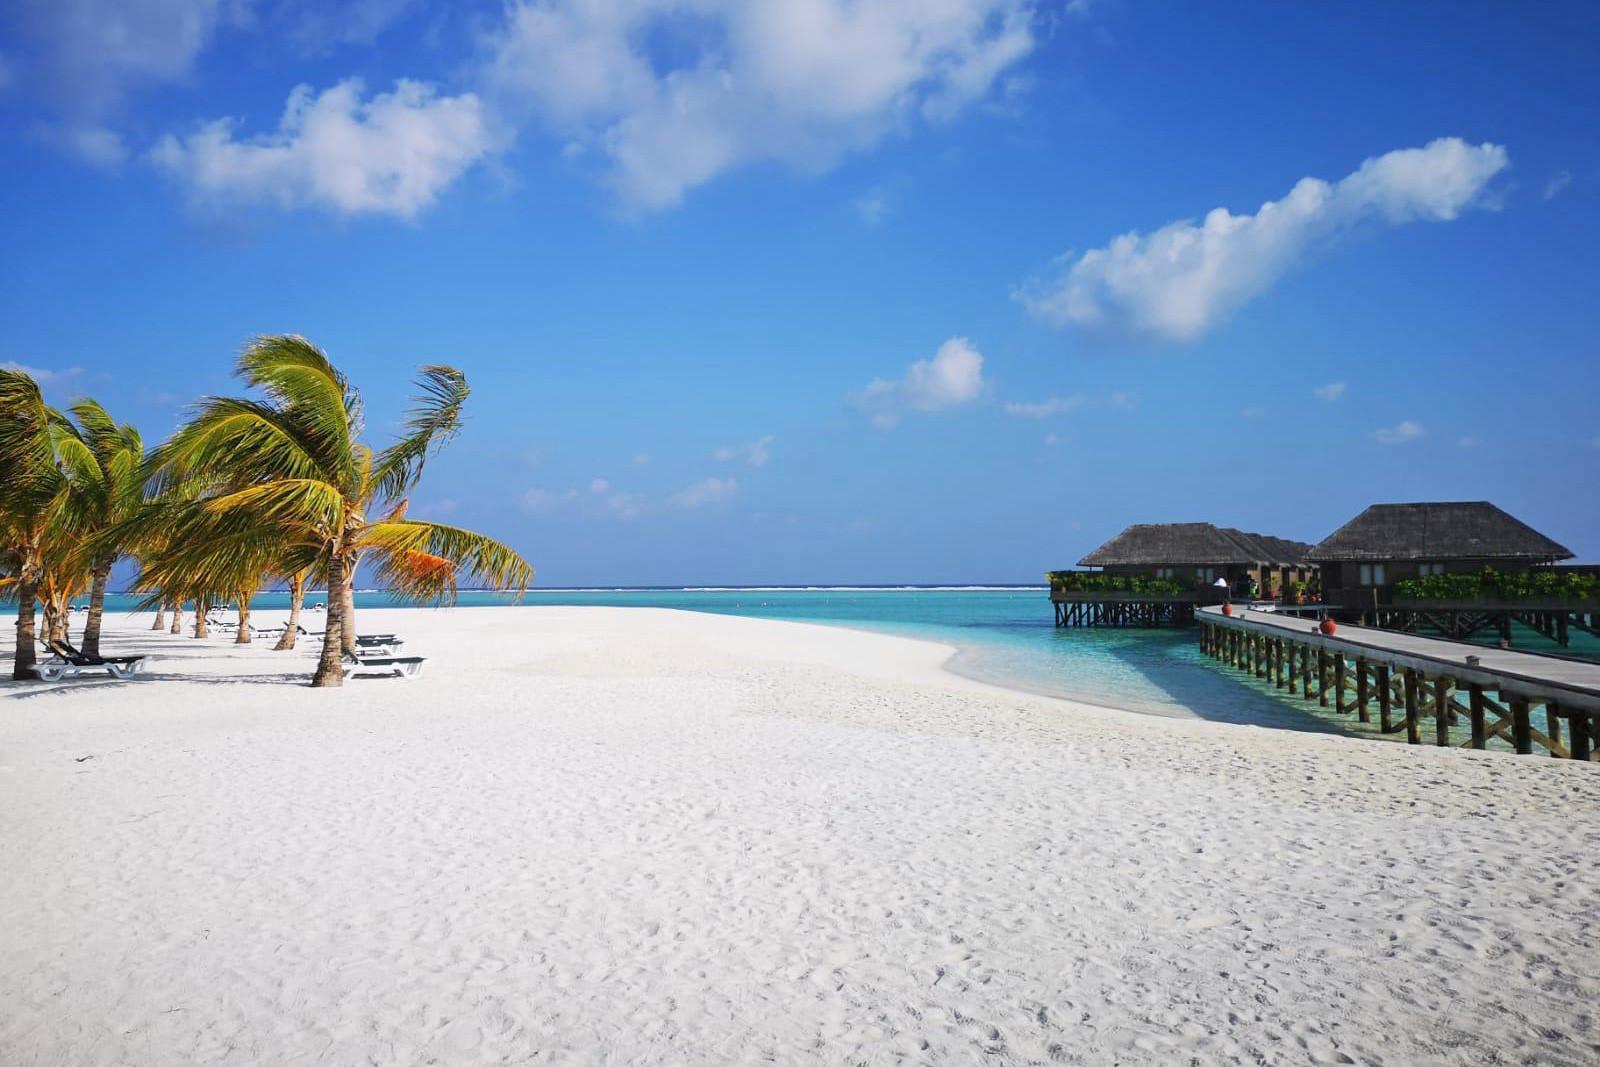 Sejur plaja Maldive, 9 zile - octombrie 2020